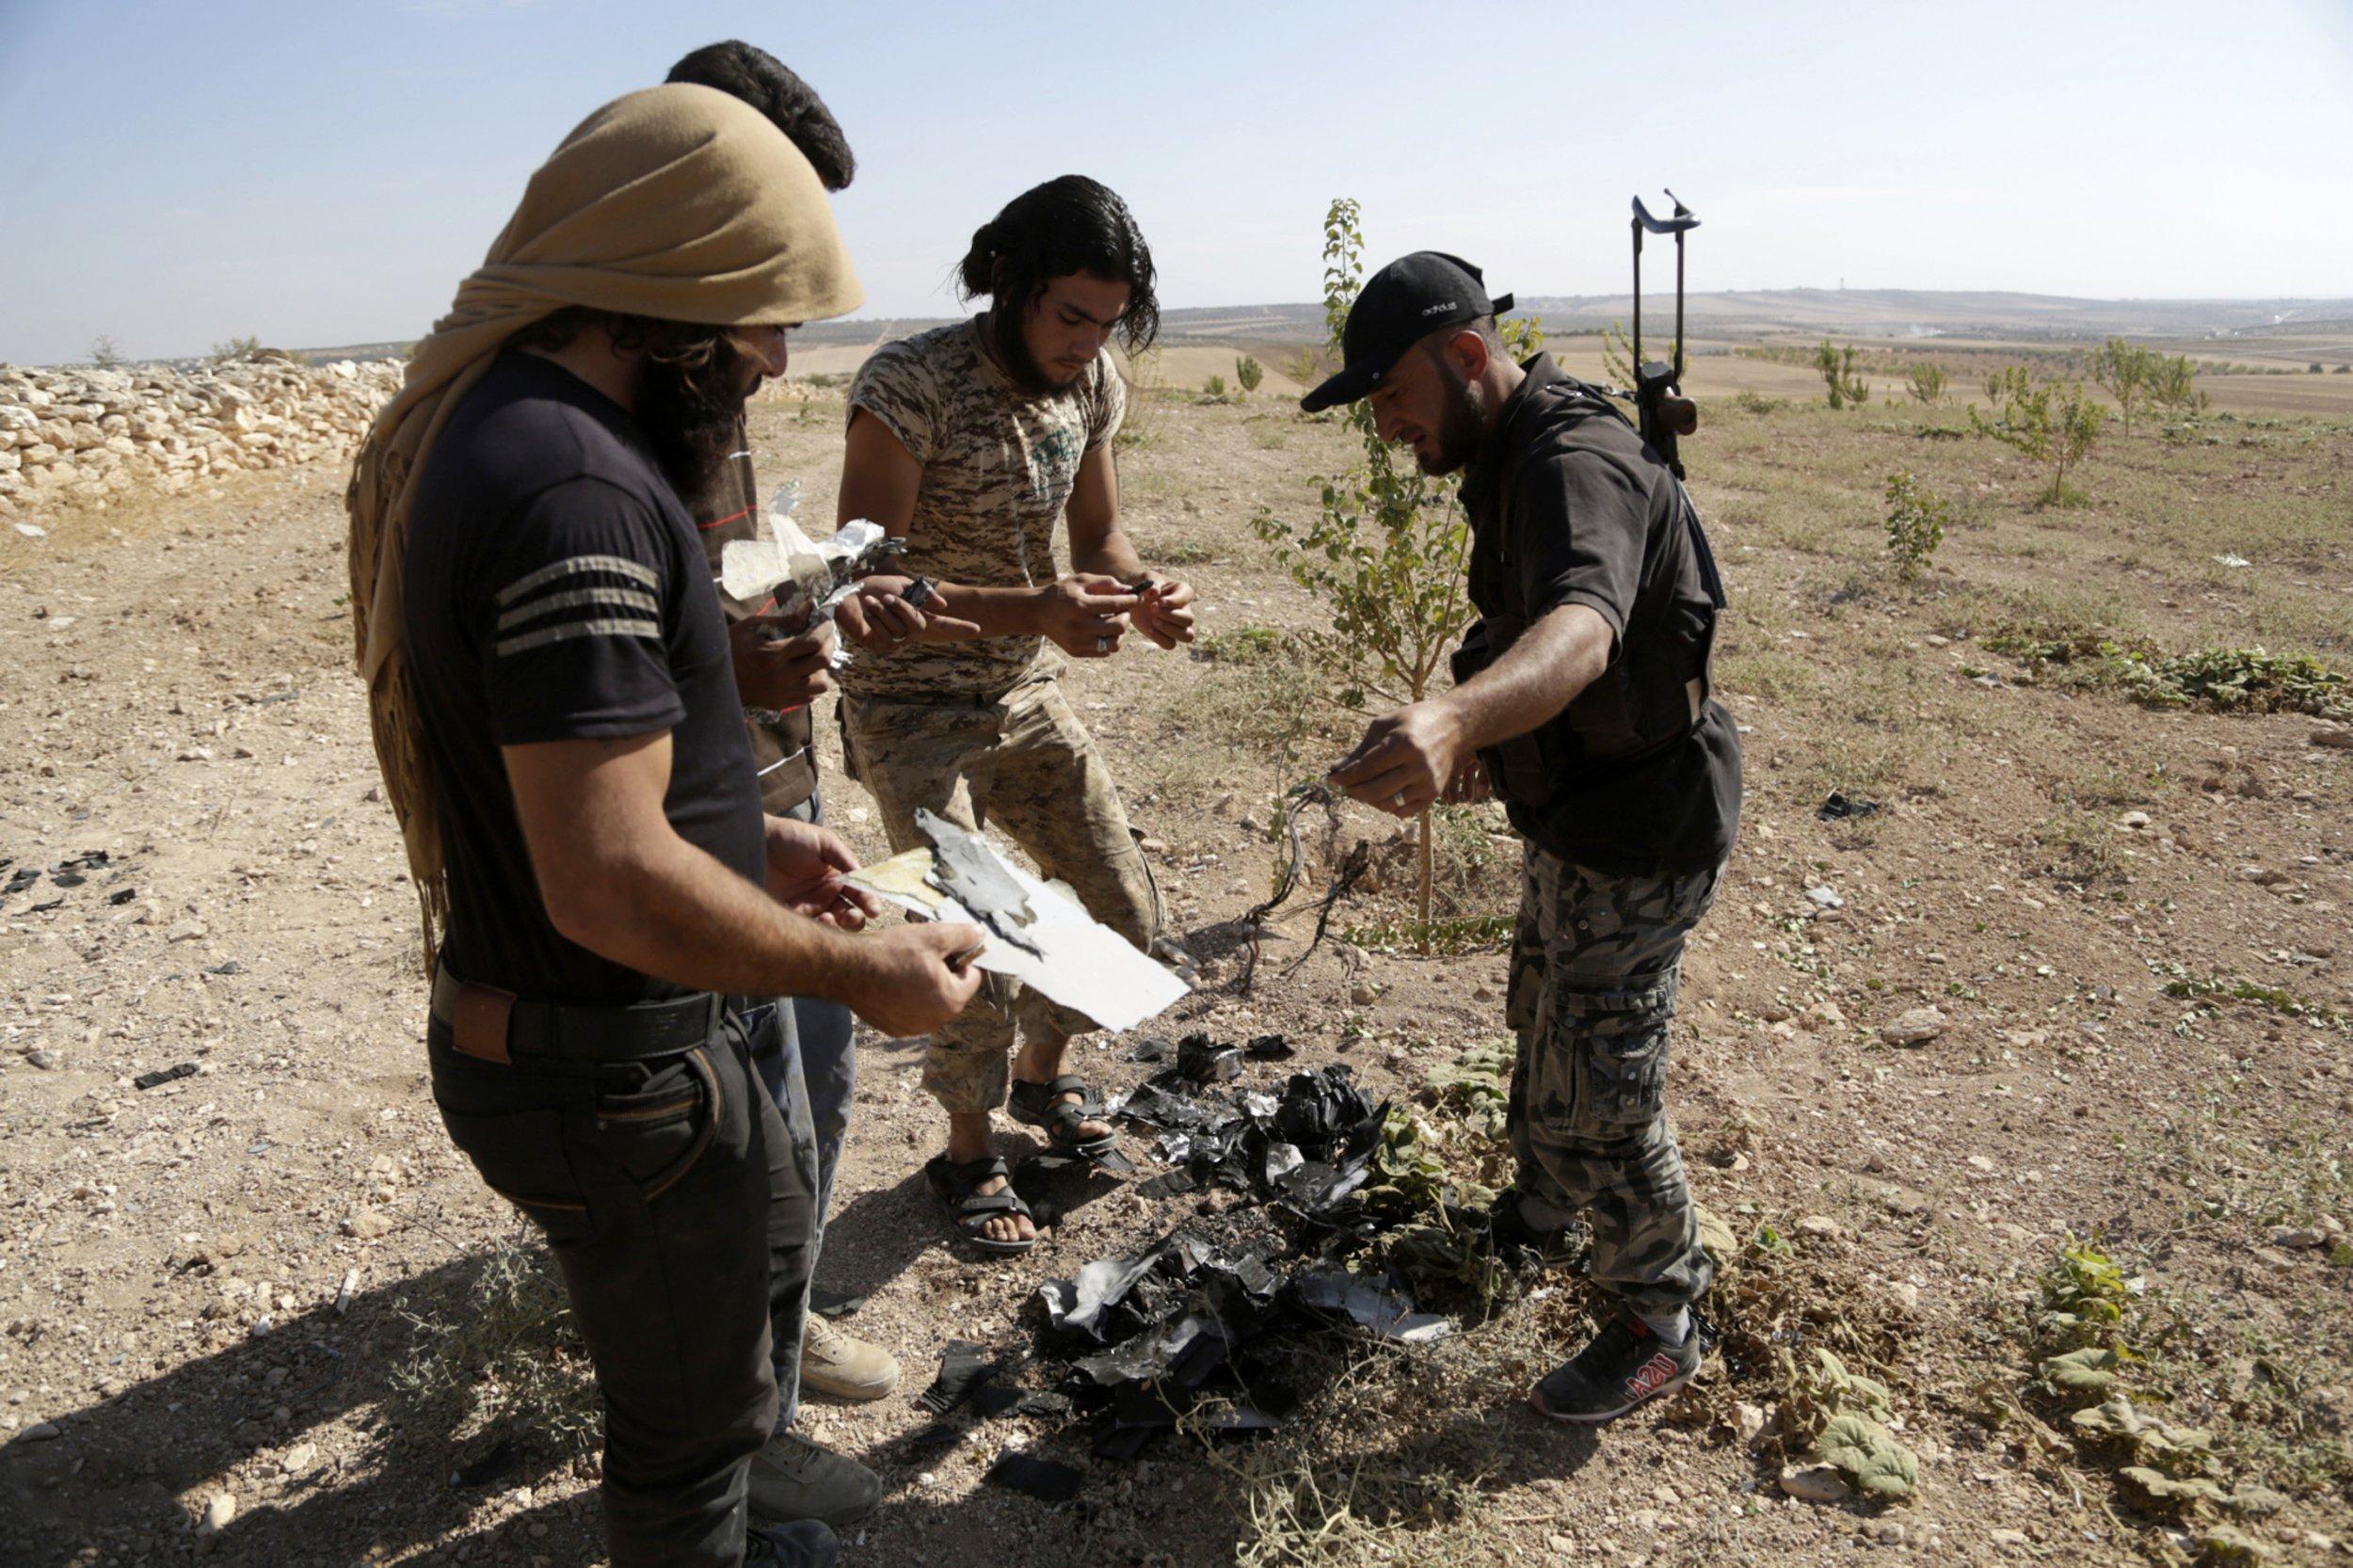 Ahrar al-Sham fighters